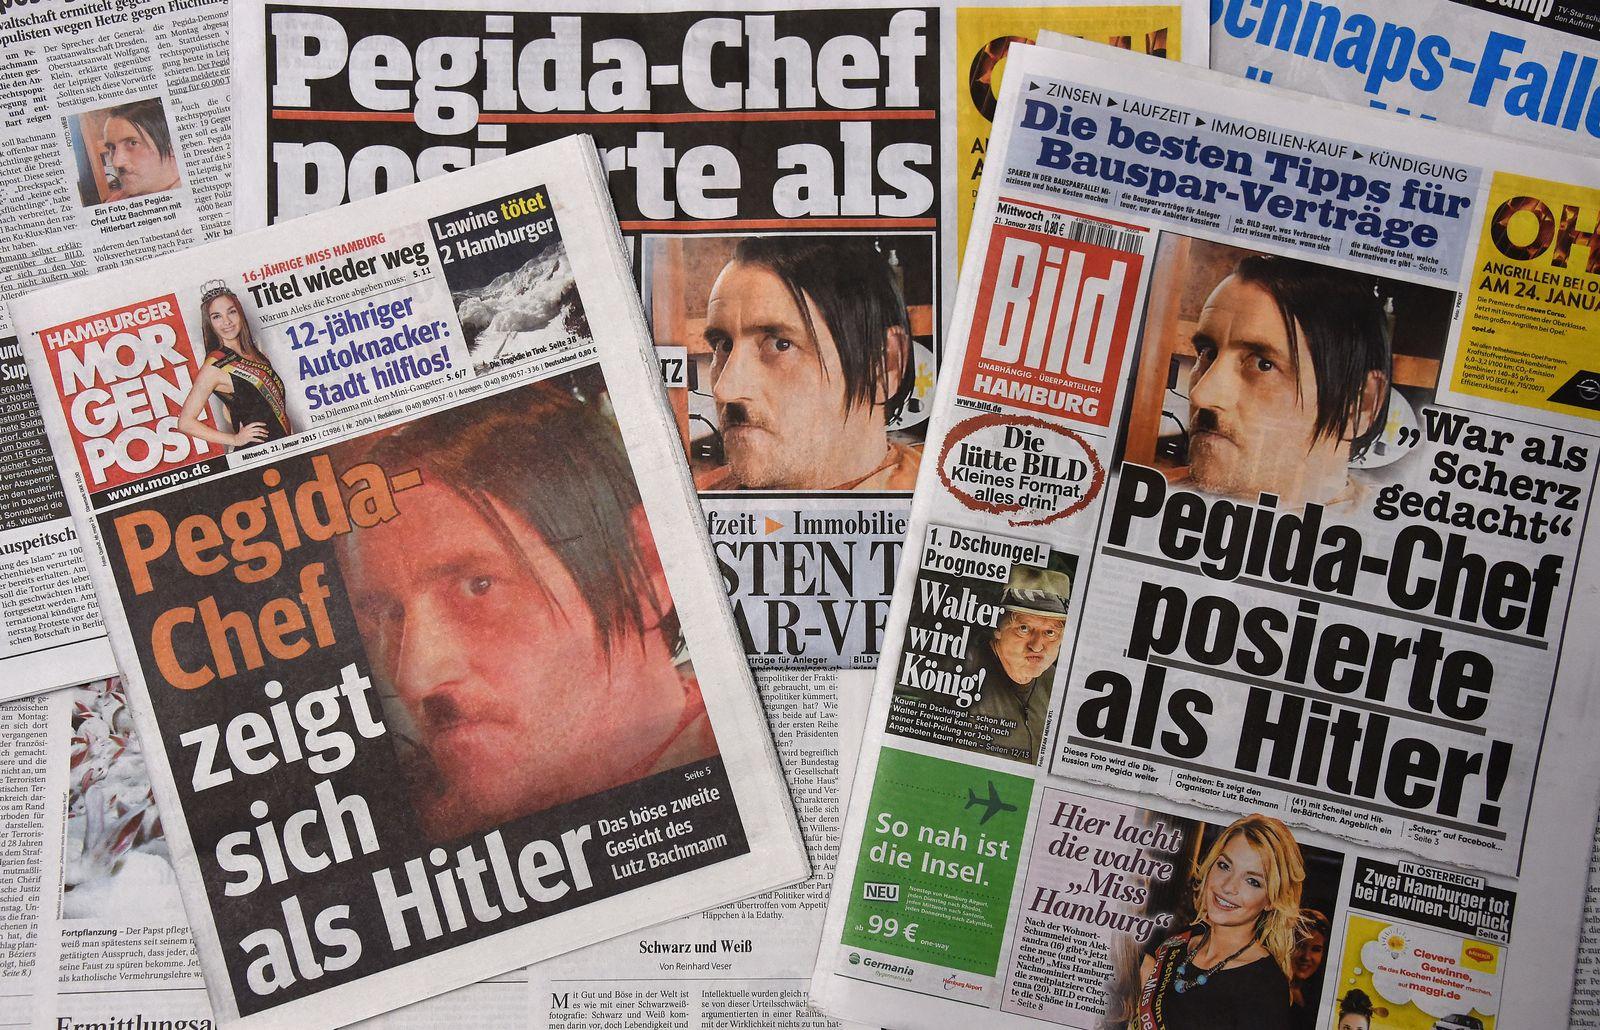 Lutz Bachmann als Hitler